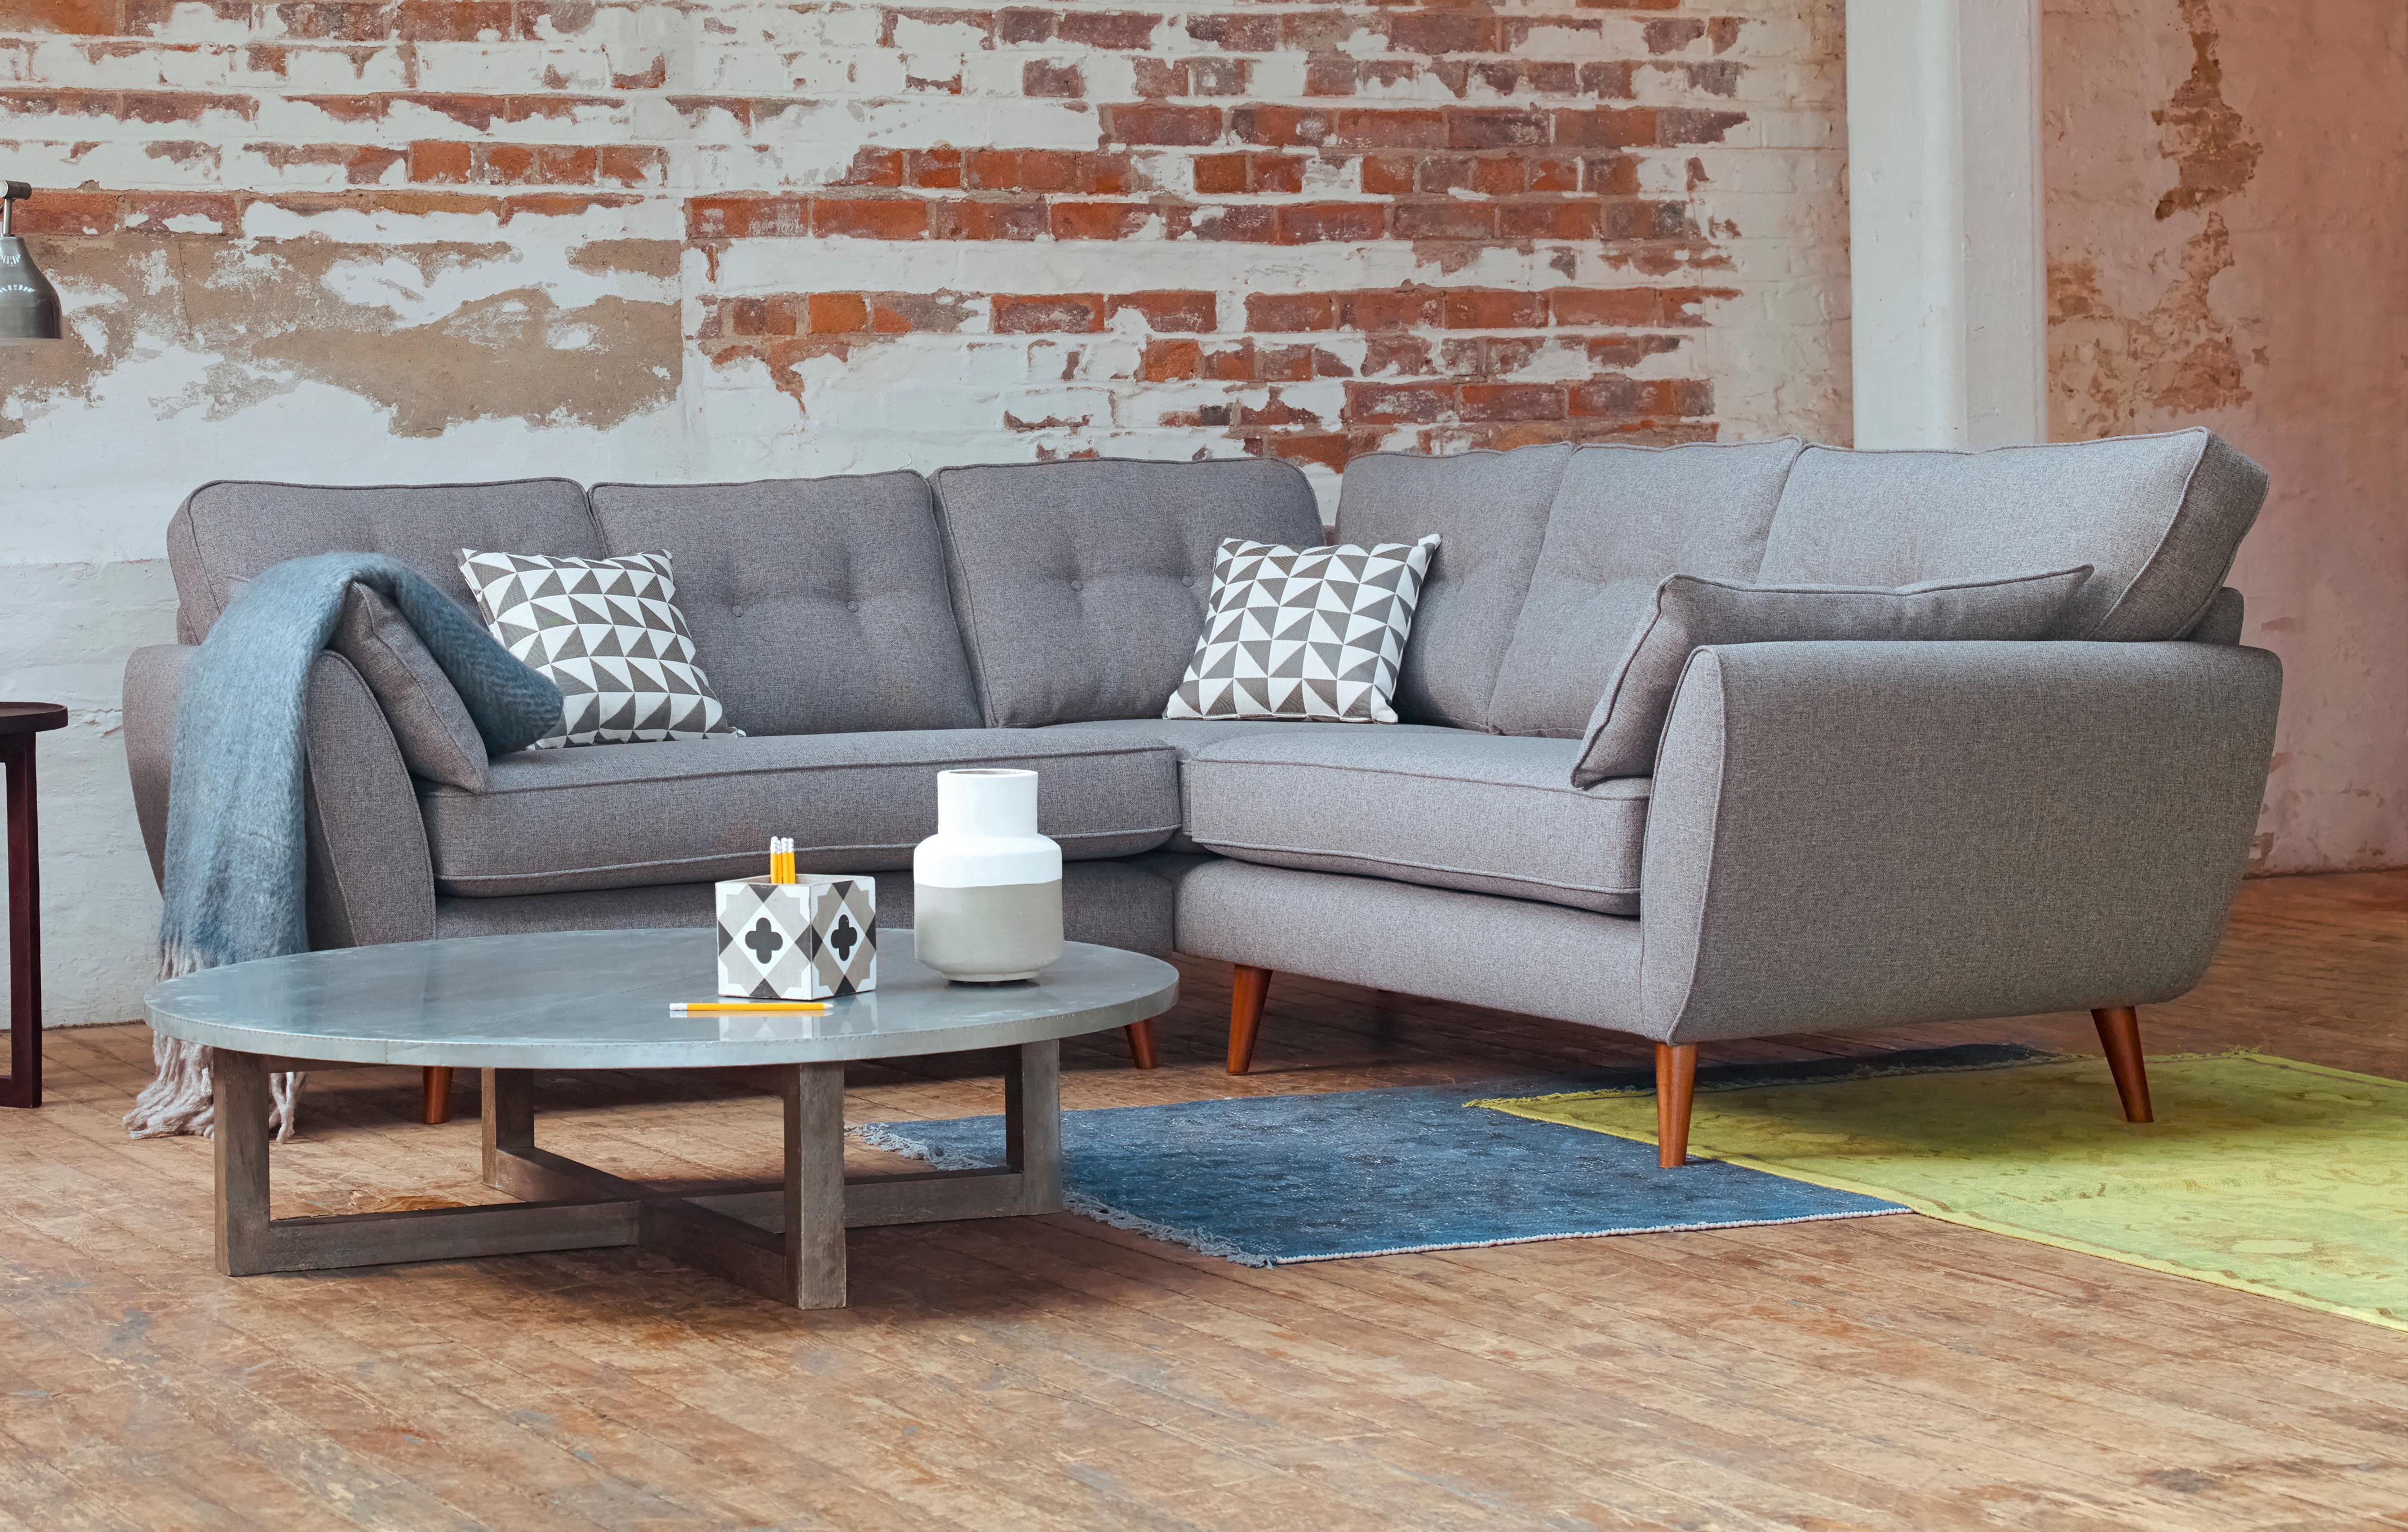 large chaise sofa dfs city liquidators beds all corner sofas spain zinc 2 piece arm group french connection